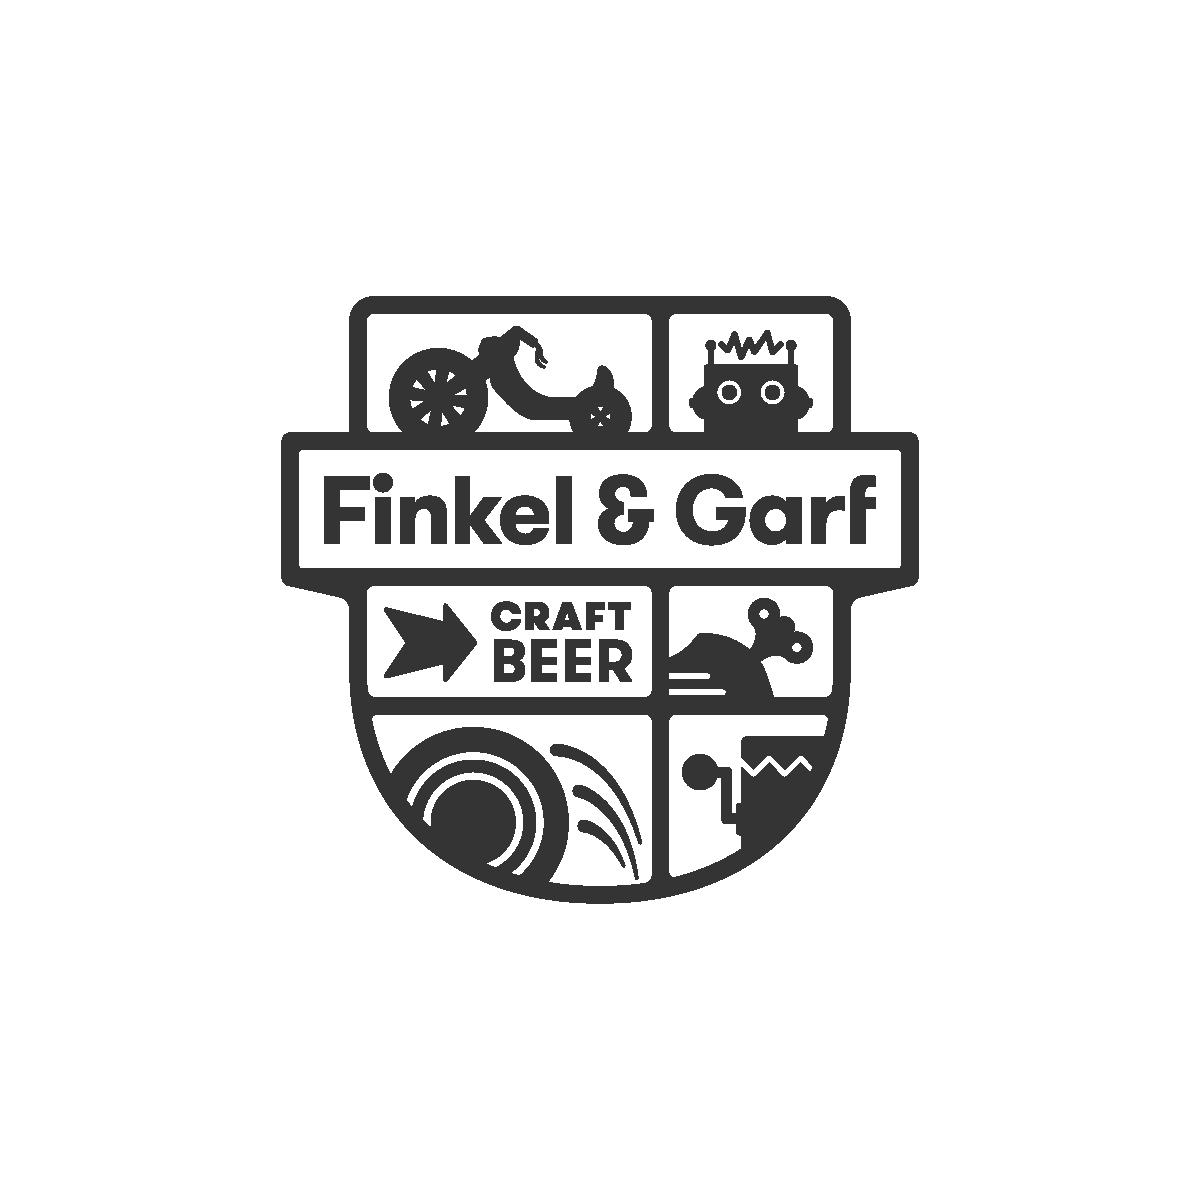 crest style logos에 대한 이미지 검색결과